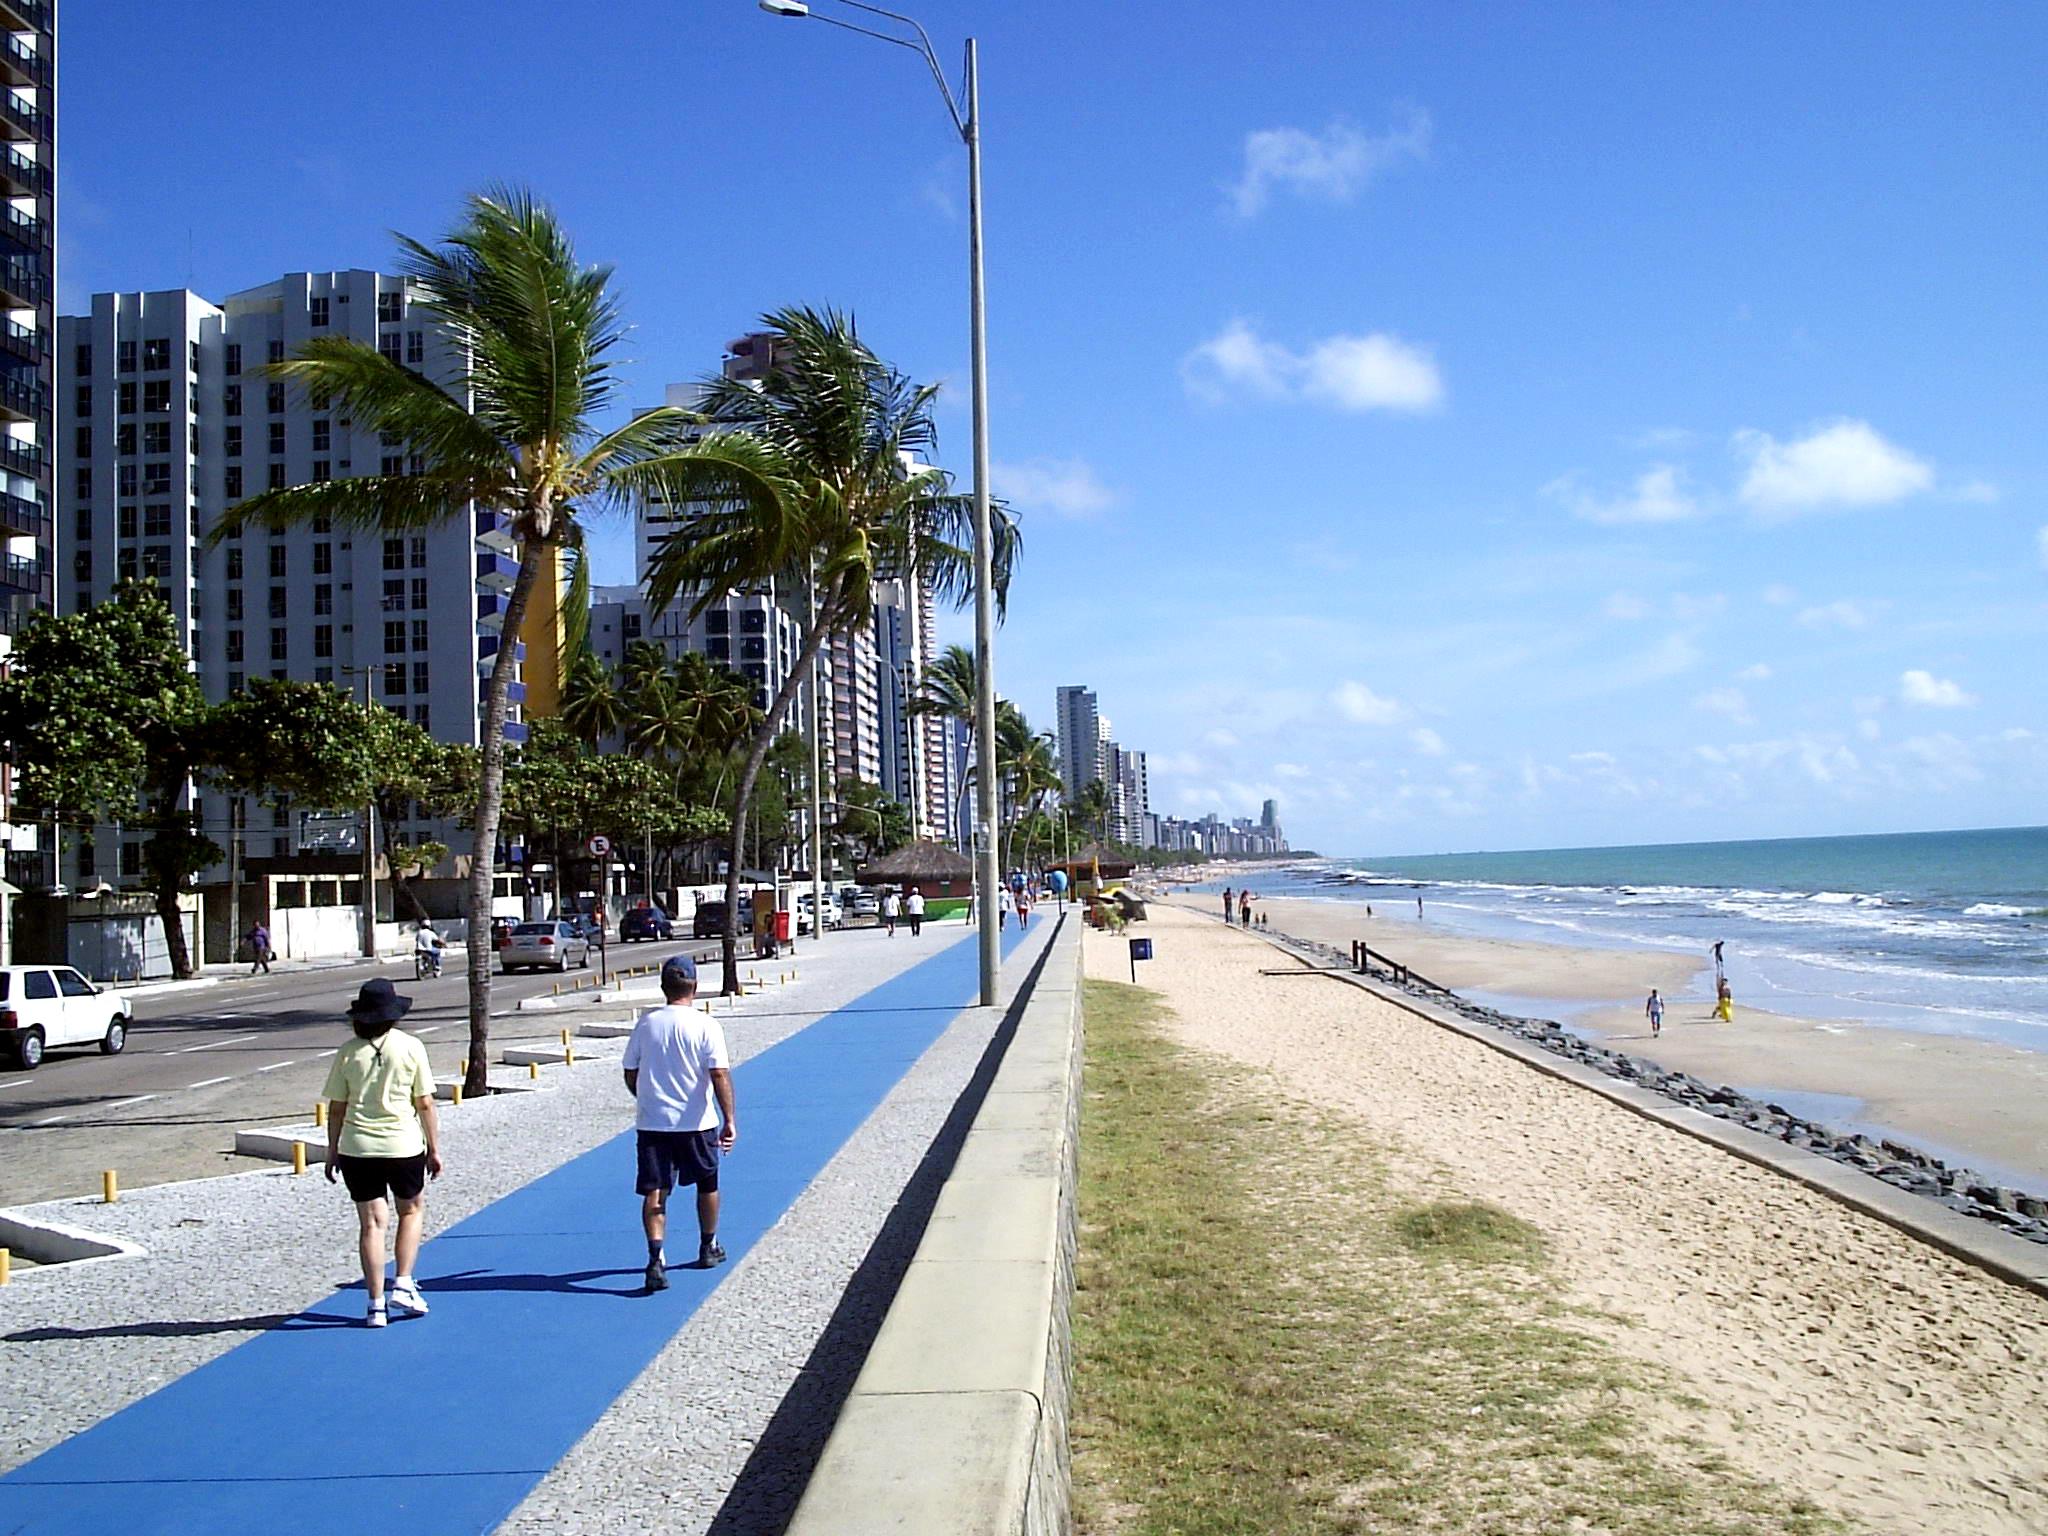 Brazil - Page 12 Recife-Boa-Viagem-Orla